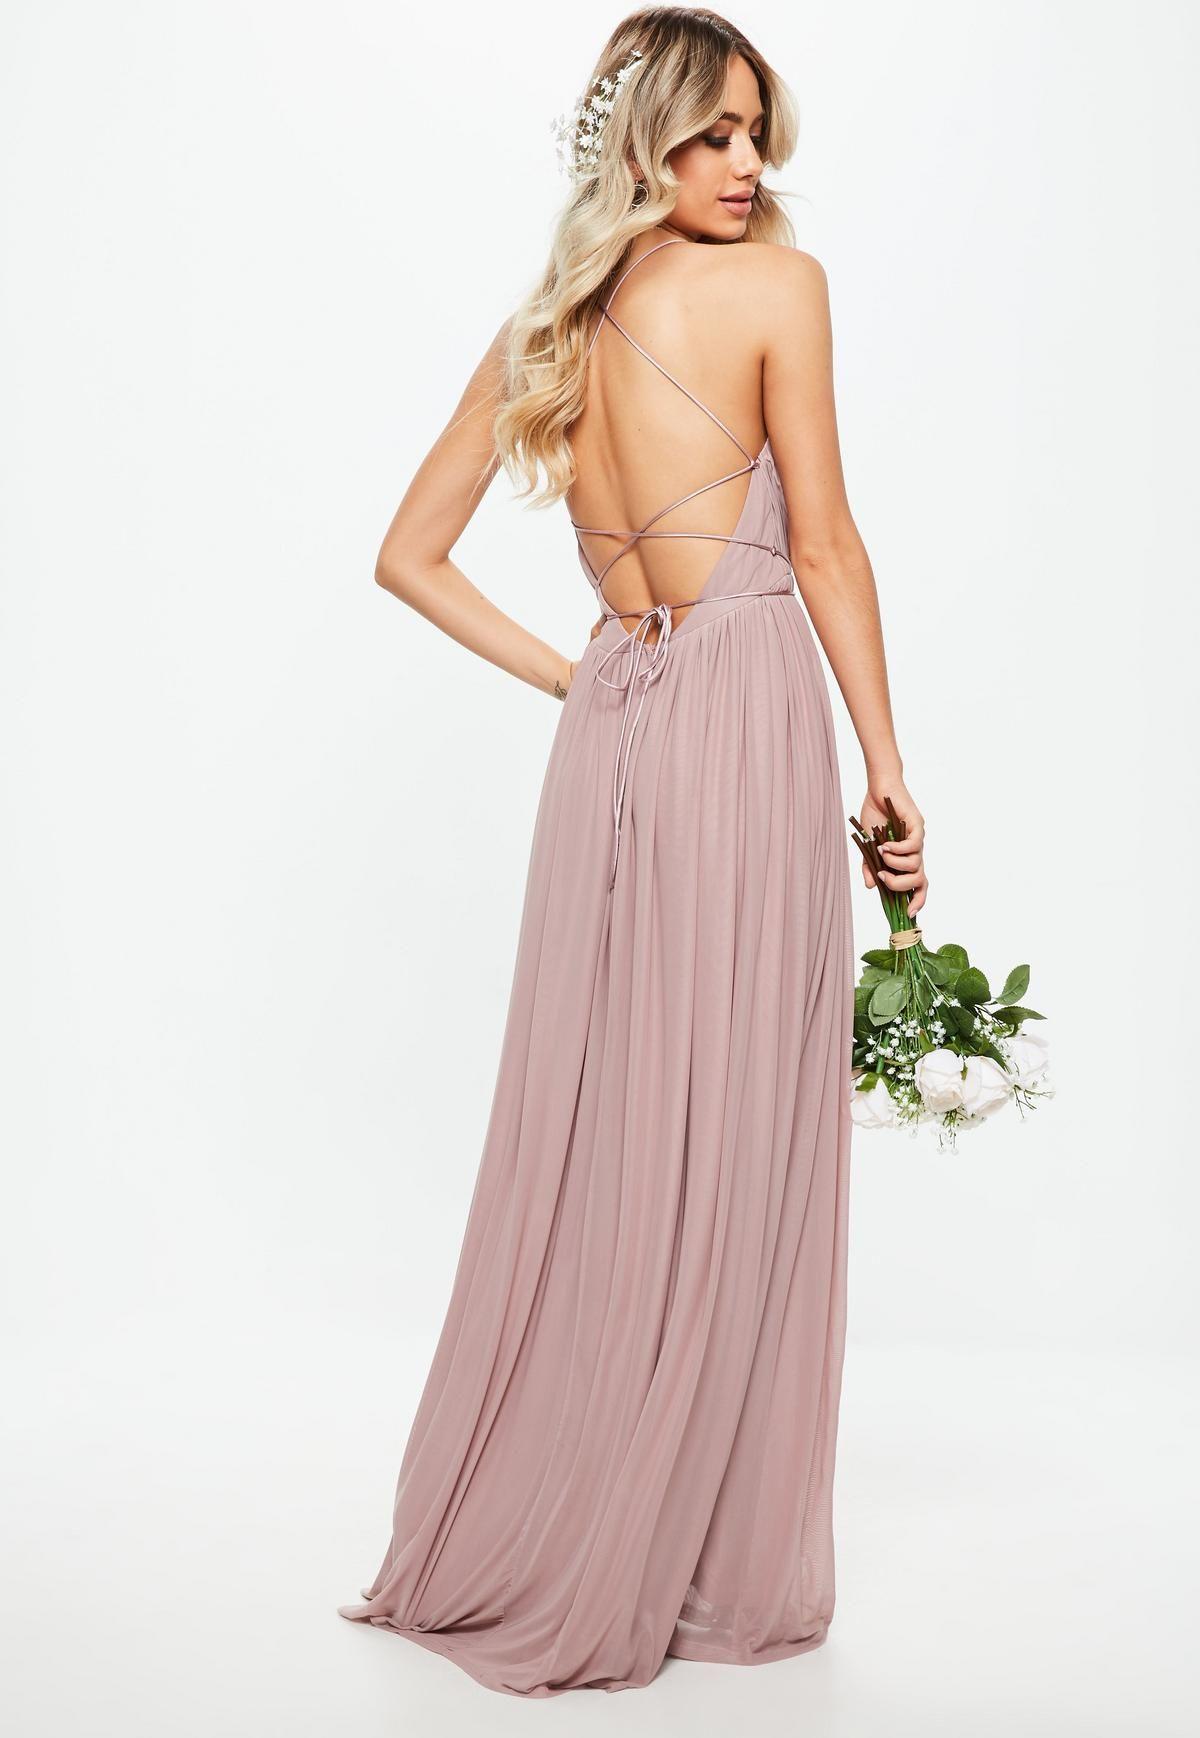 Dani Love Island prom dress